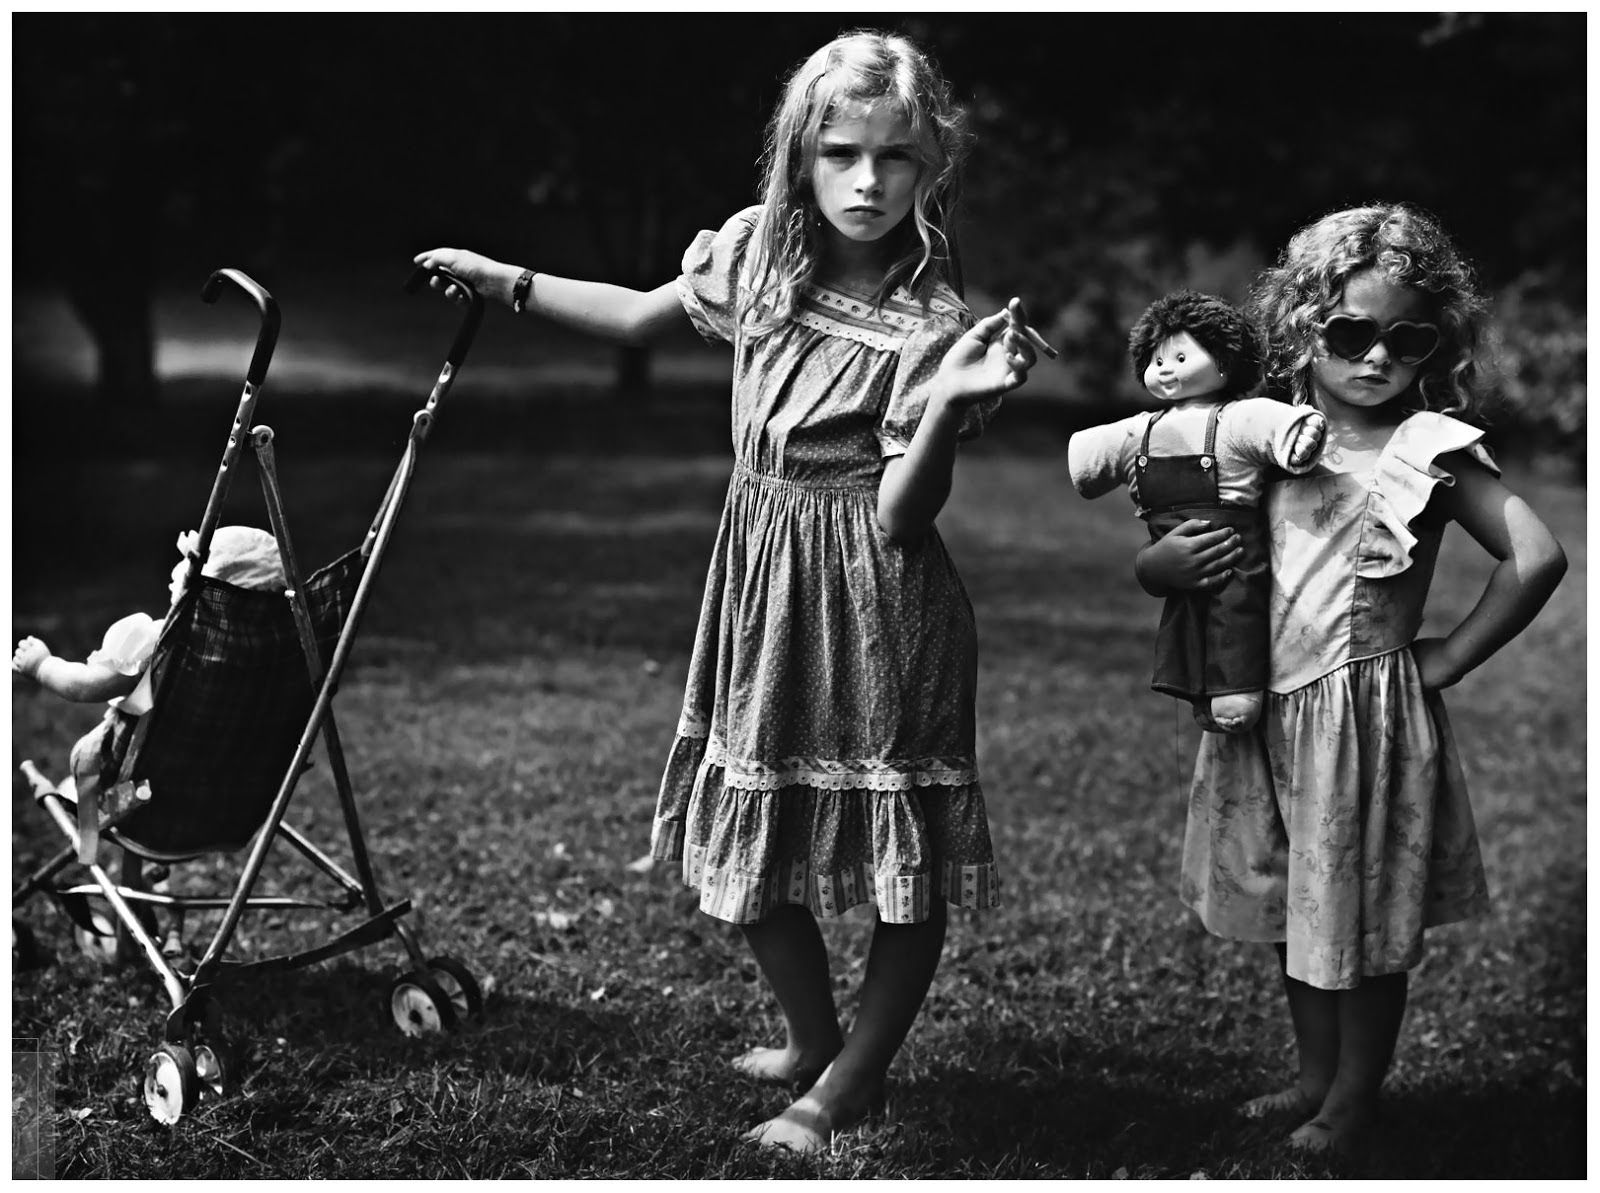 Sally Mann | Photography Artist | Салли манн, Фотографии